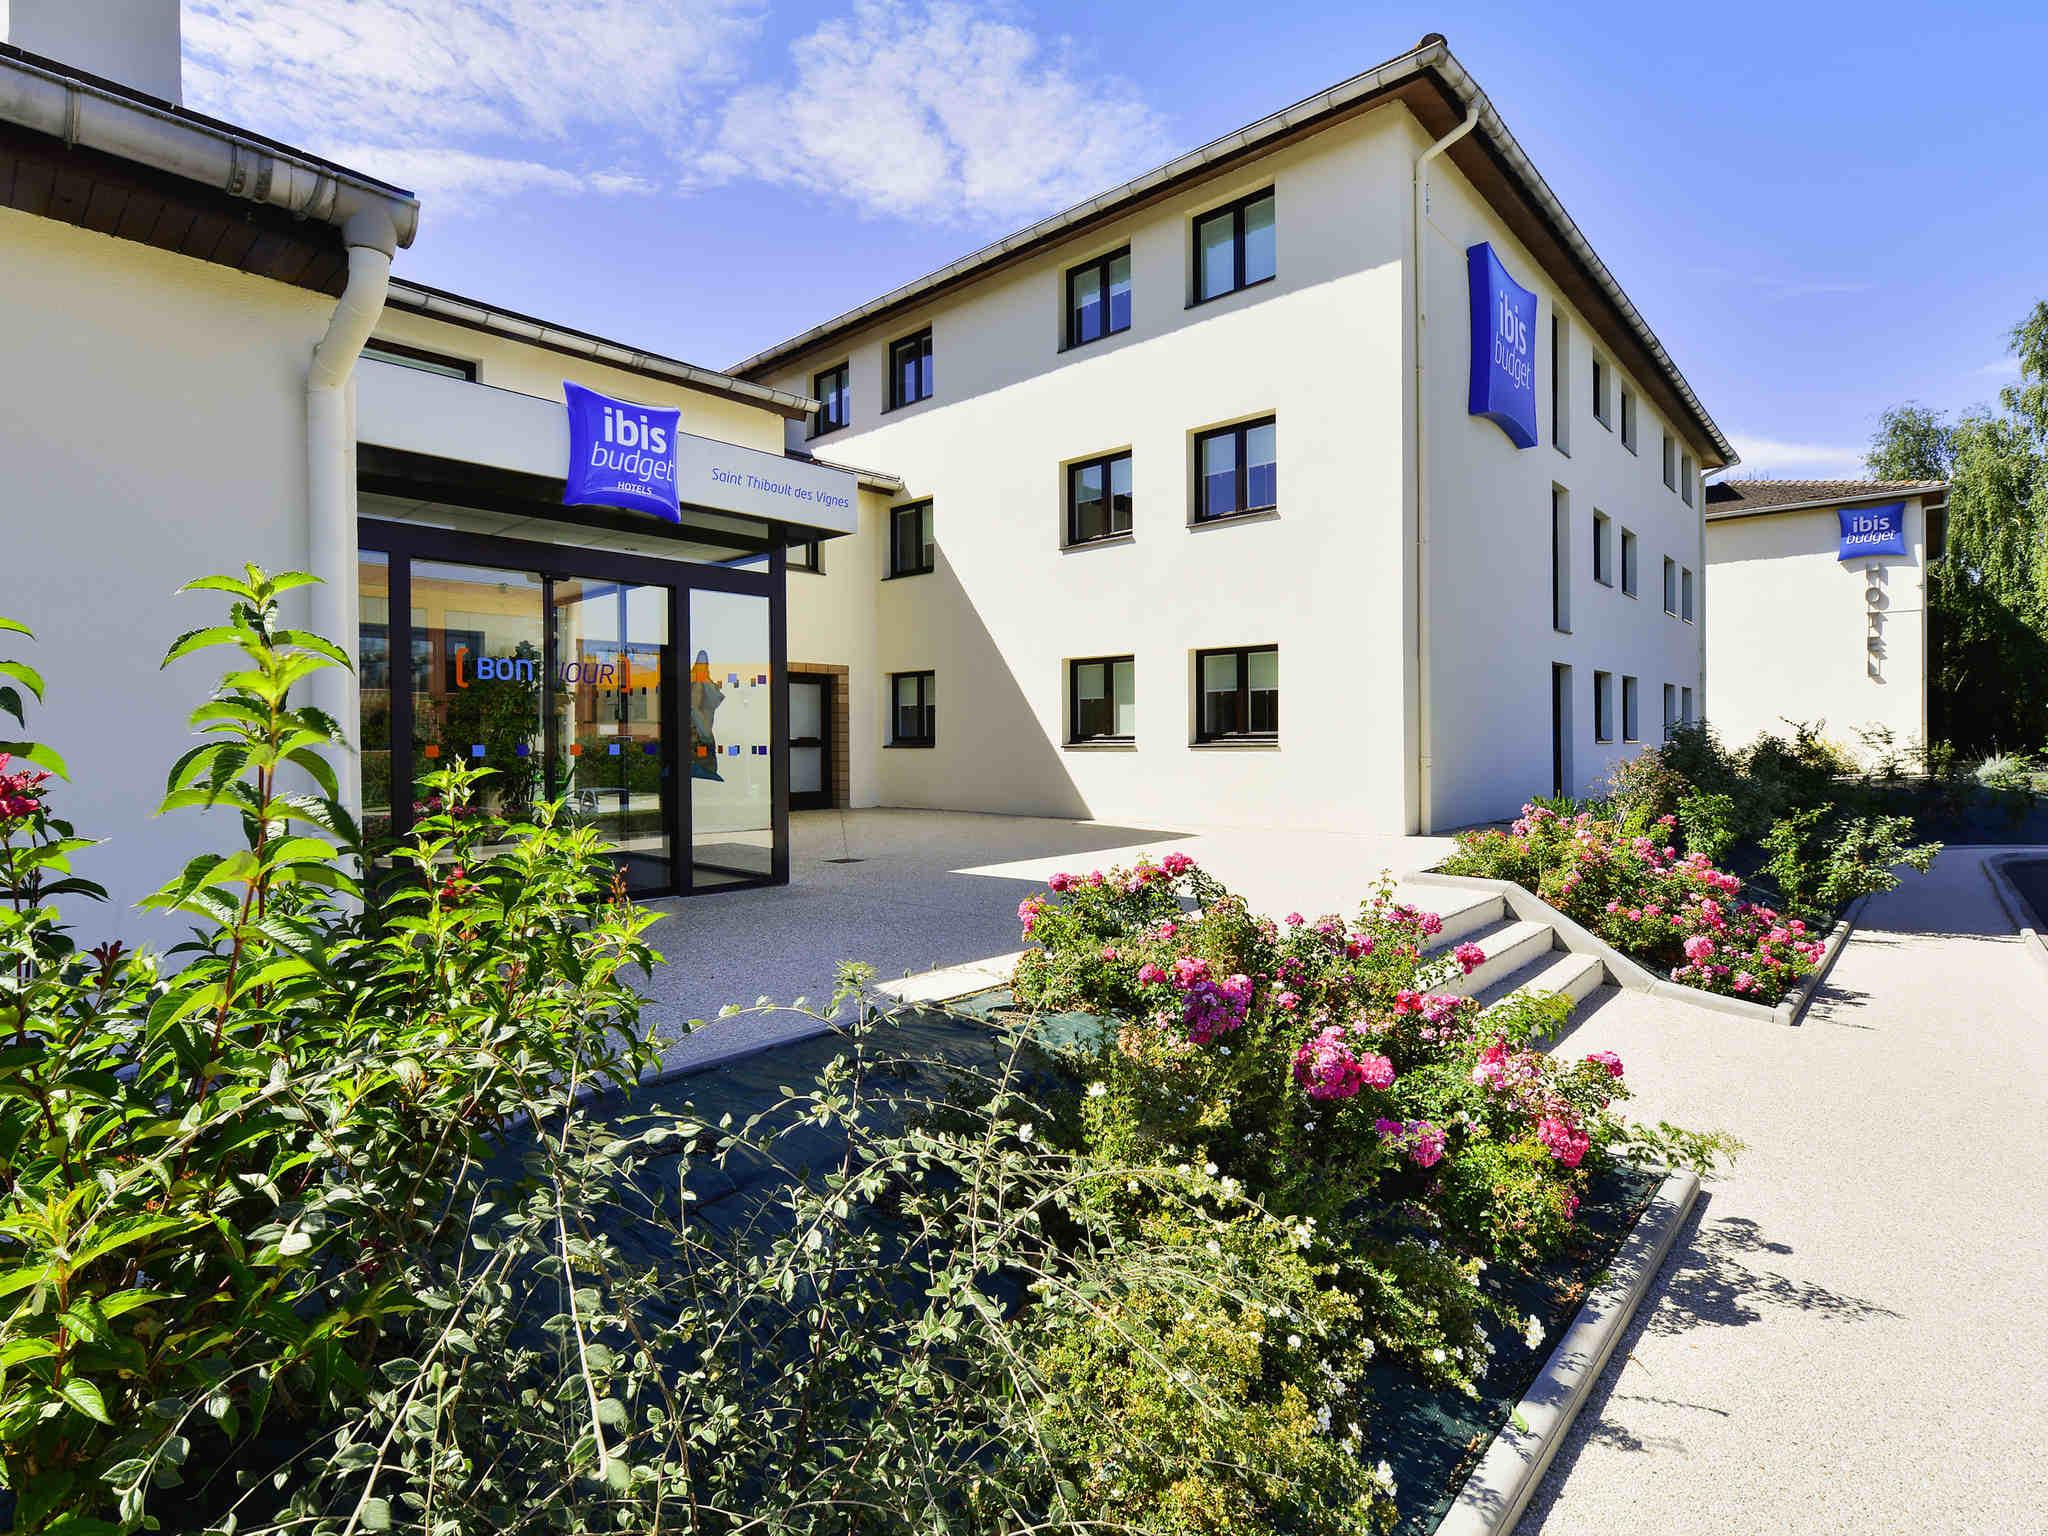 Hotel – ibis budget Marne la Vallée